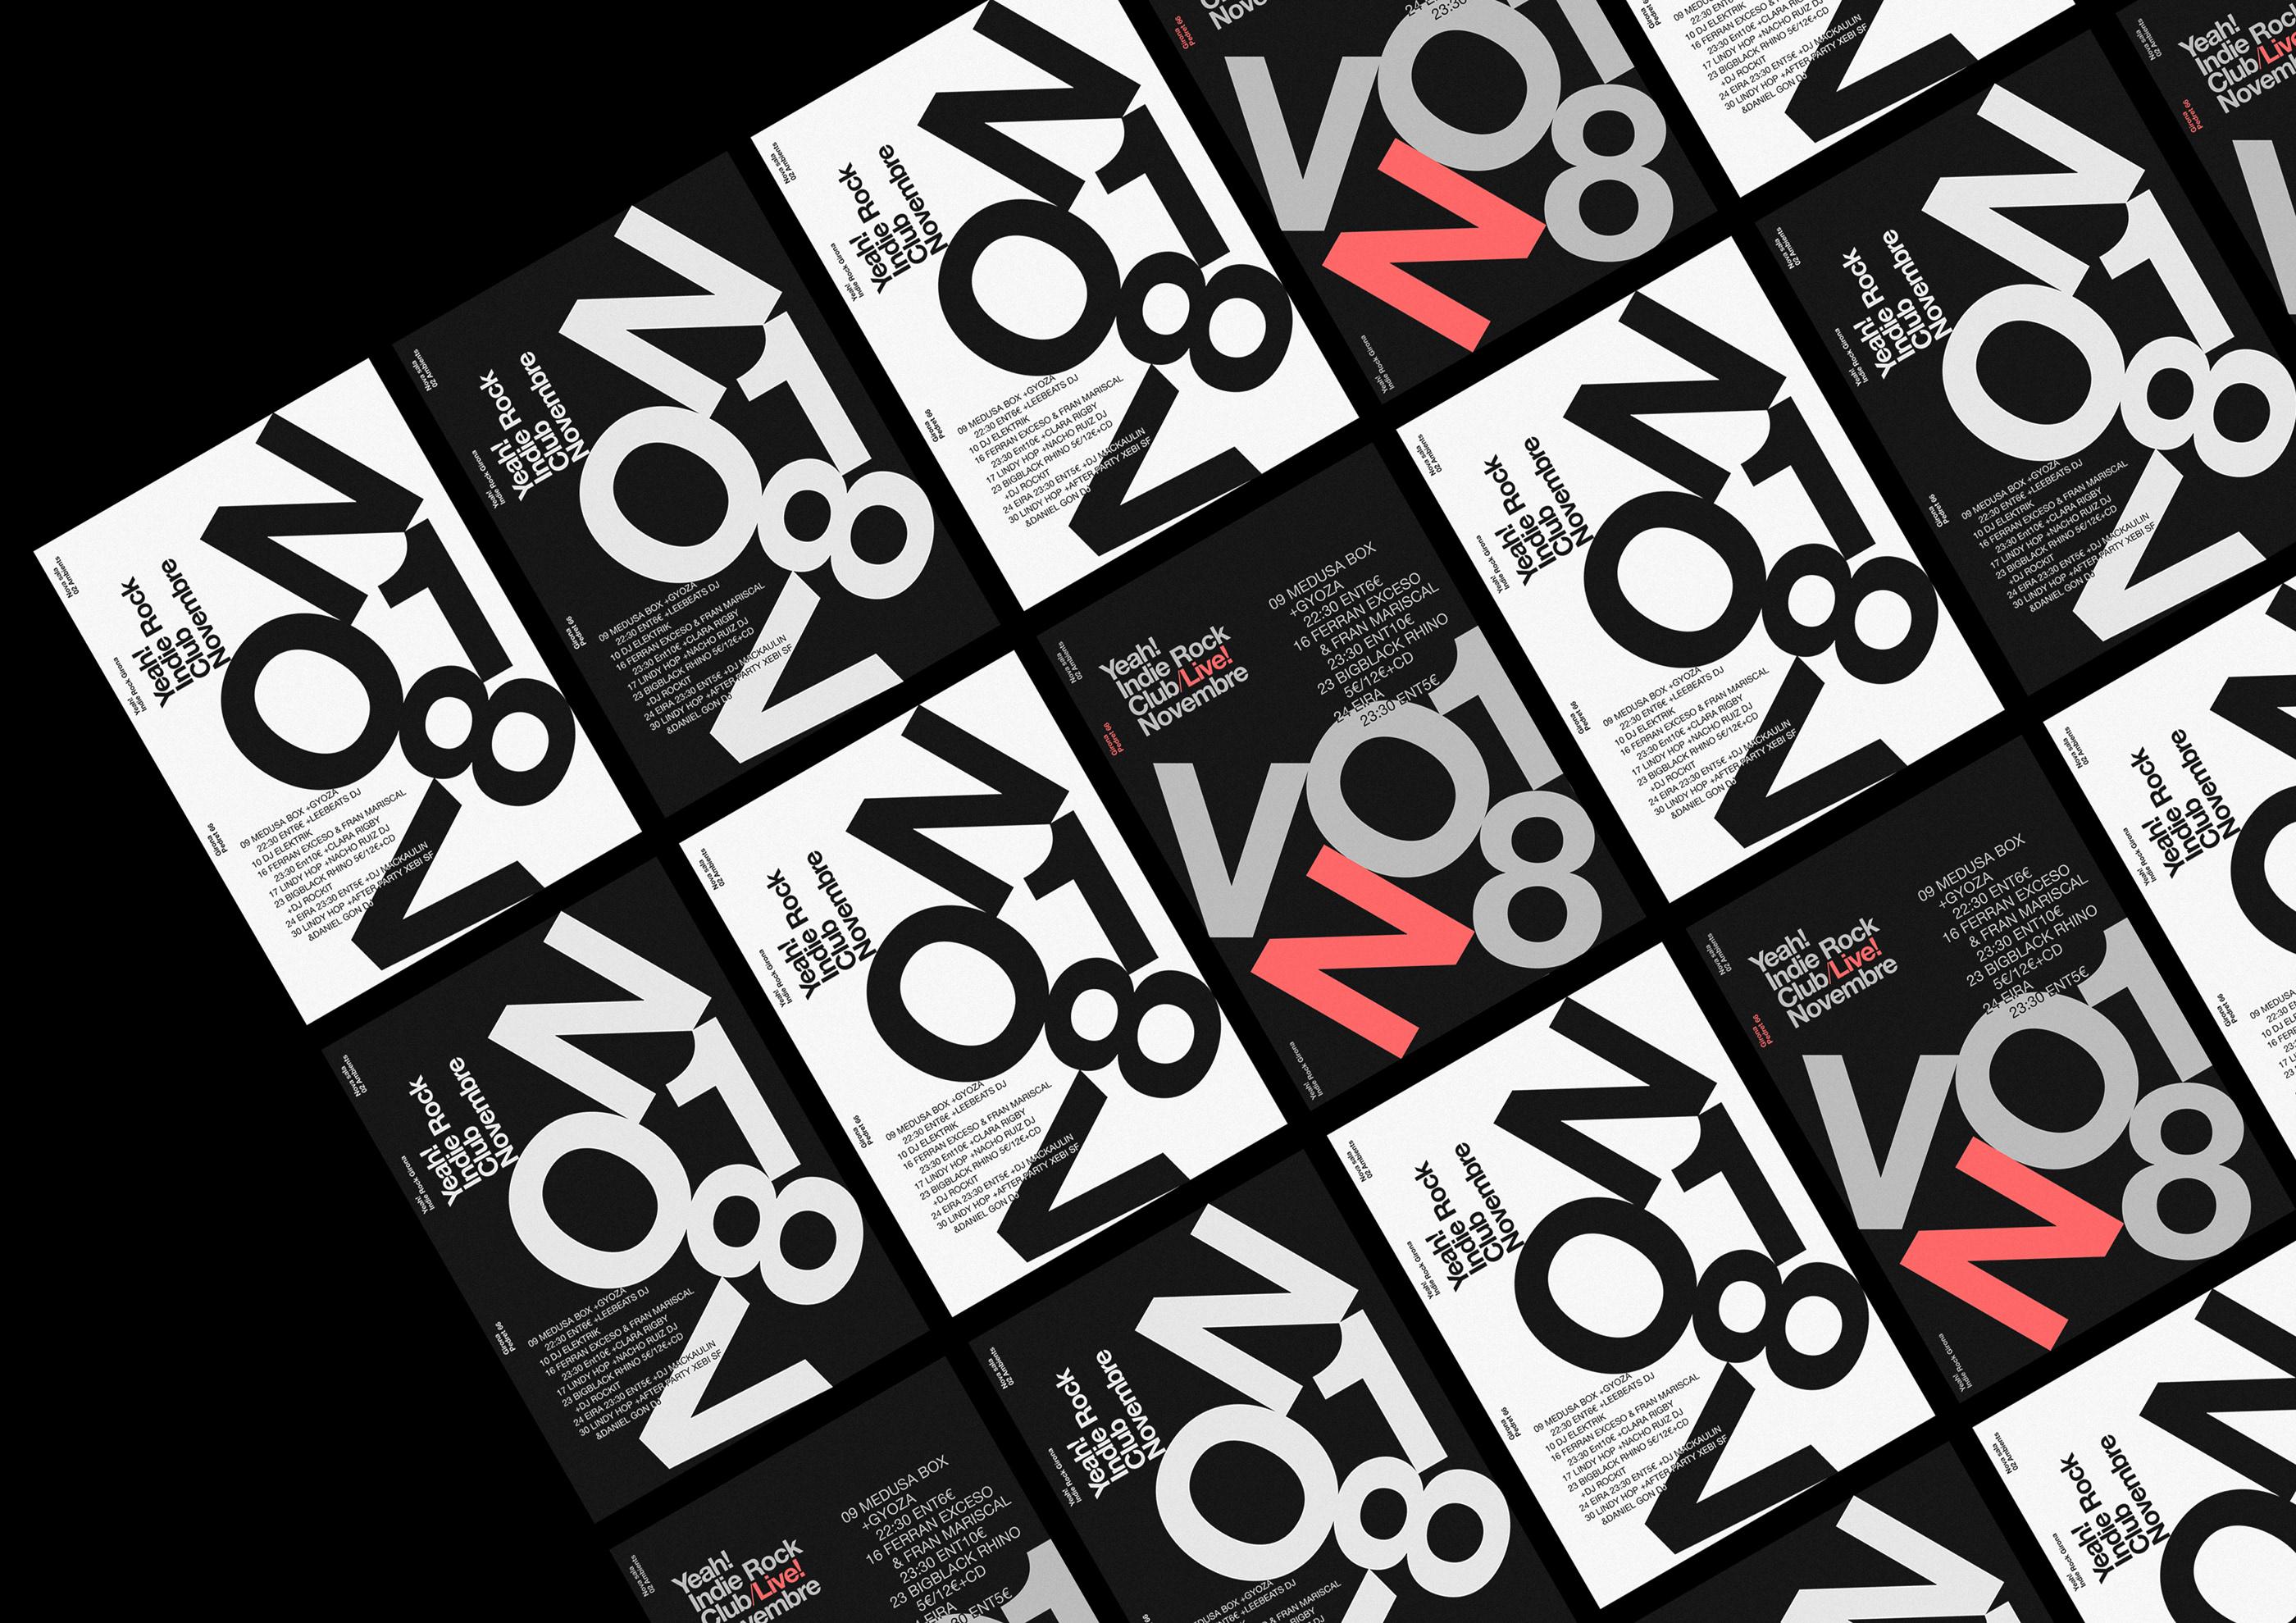 poster design contrast